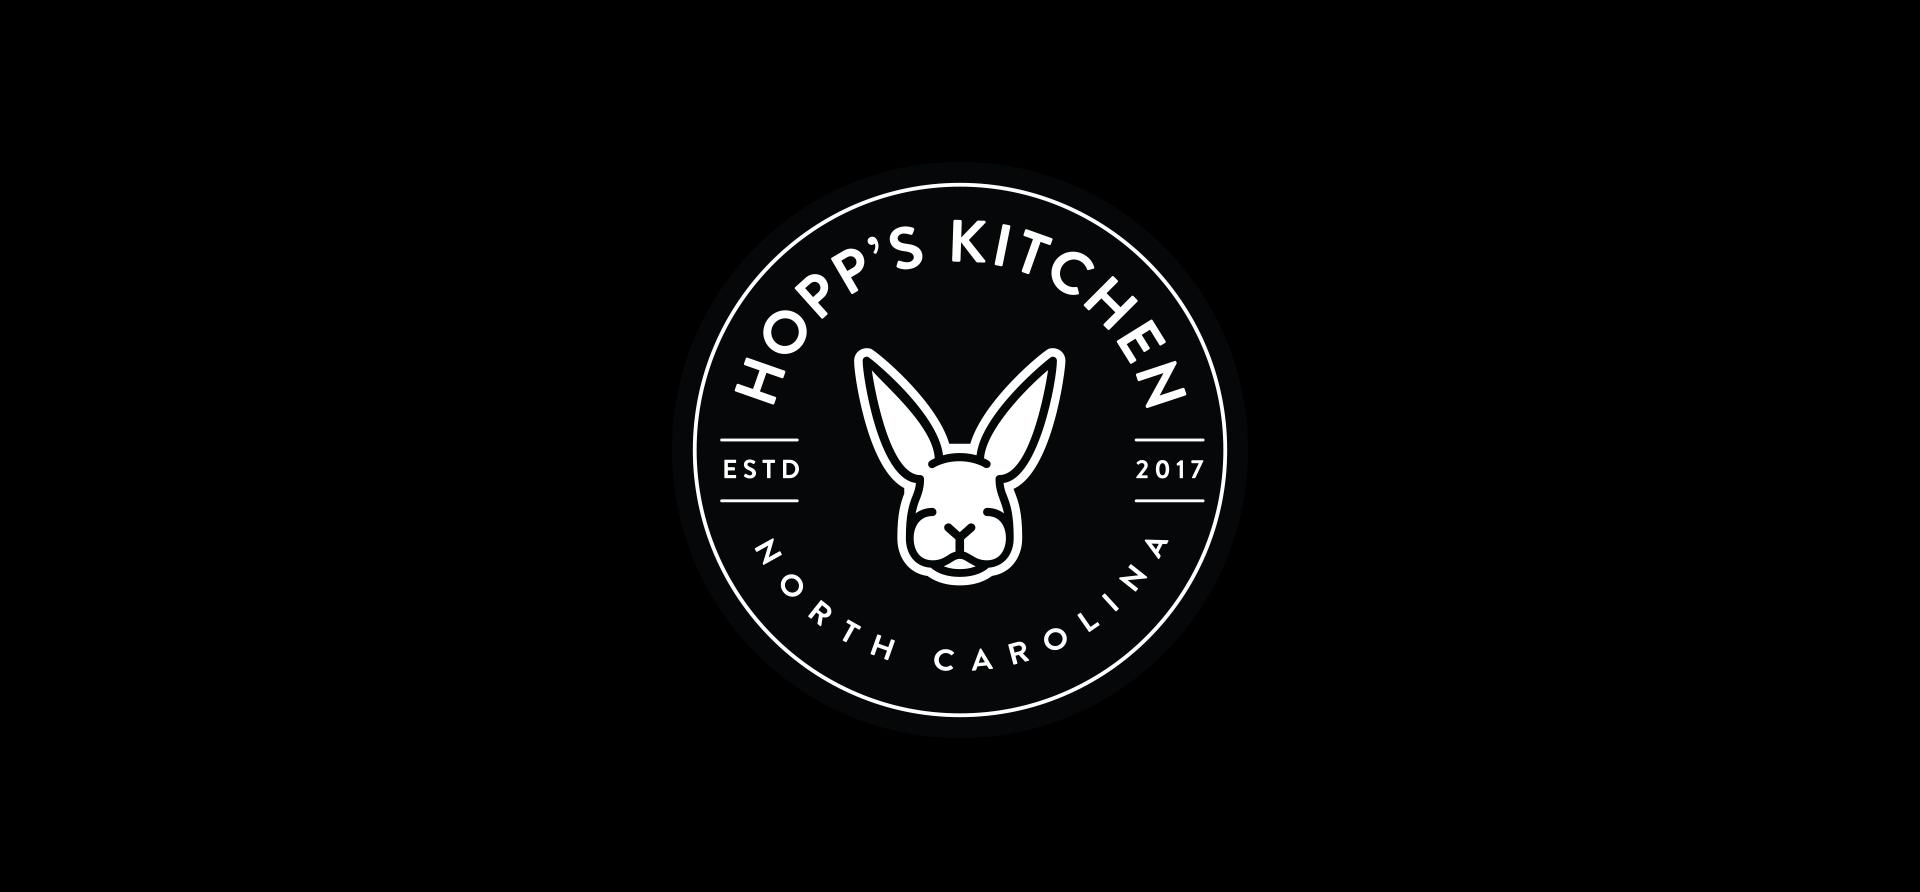 HoppsKitchenLogoOnly.png